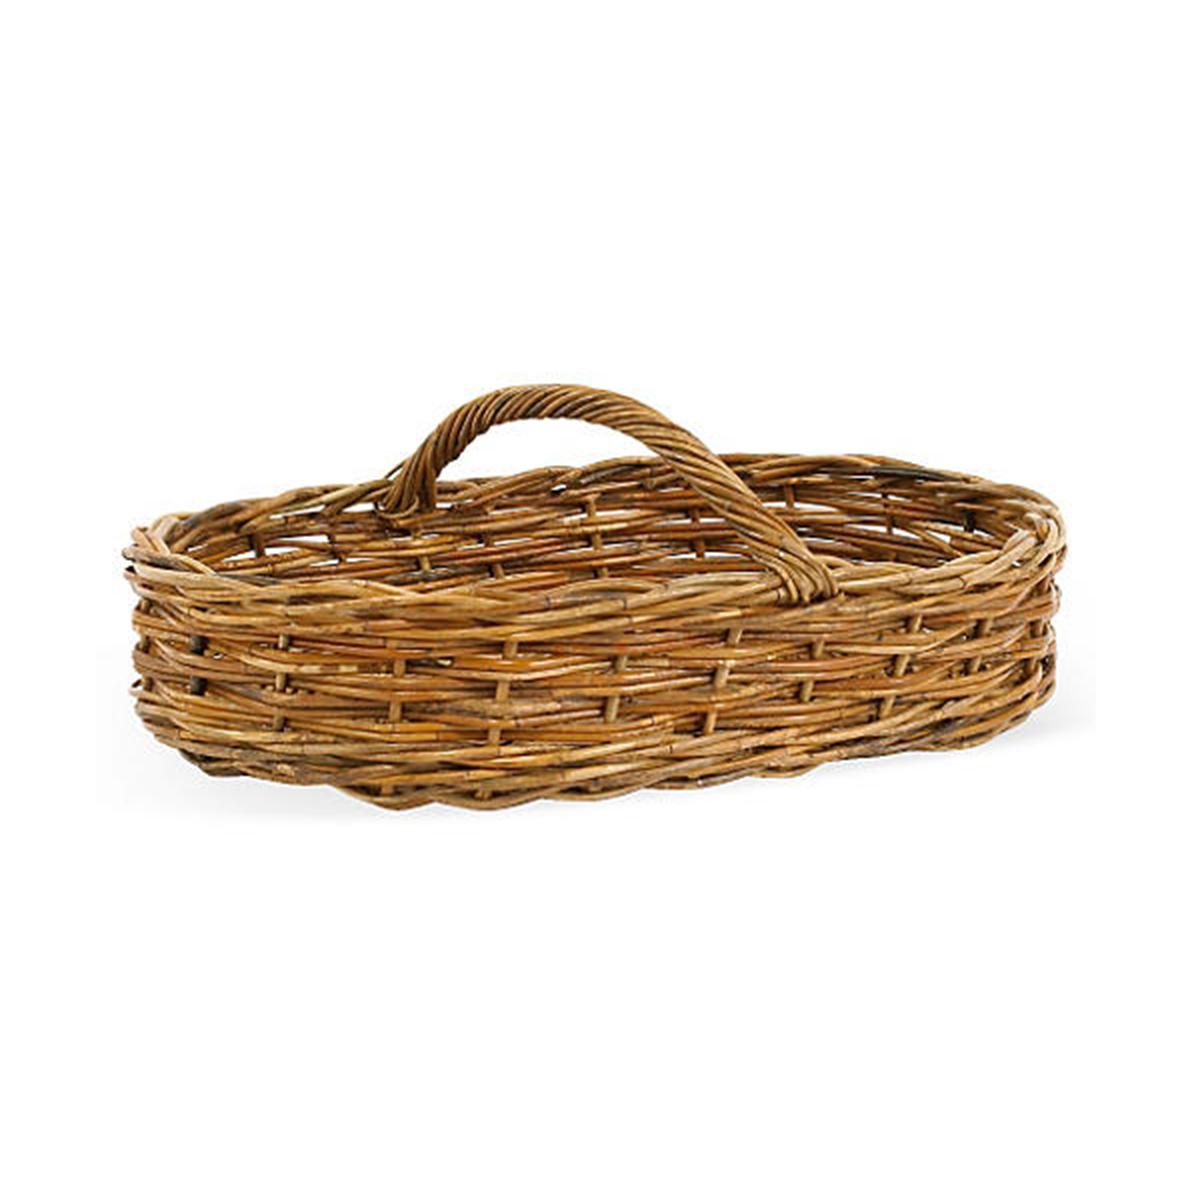 moracan rectangle basket.jpg